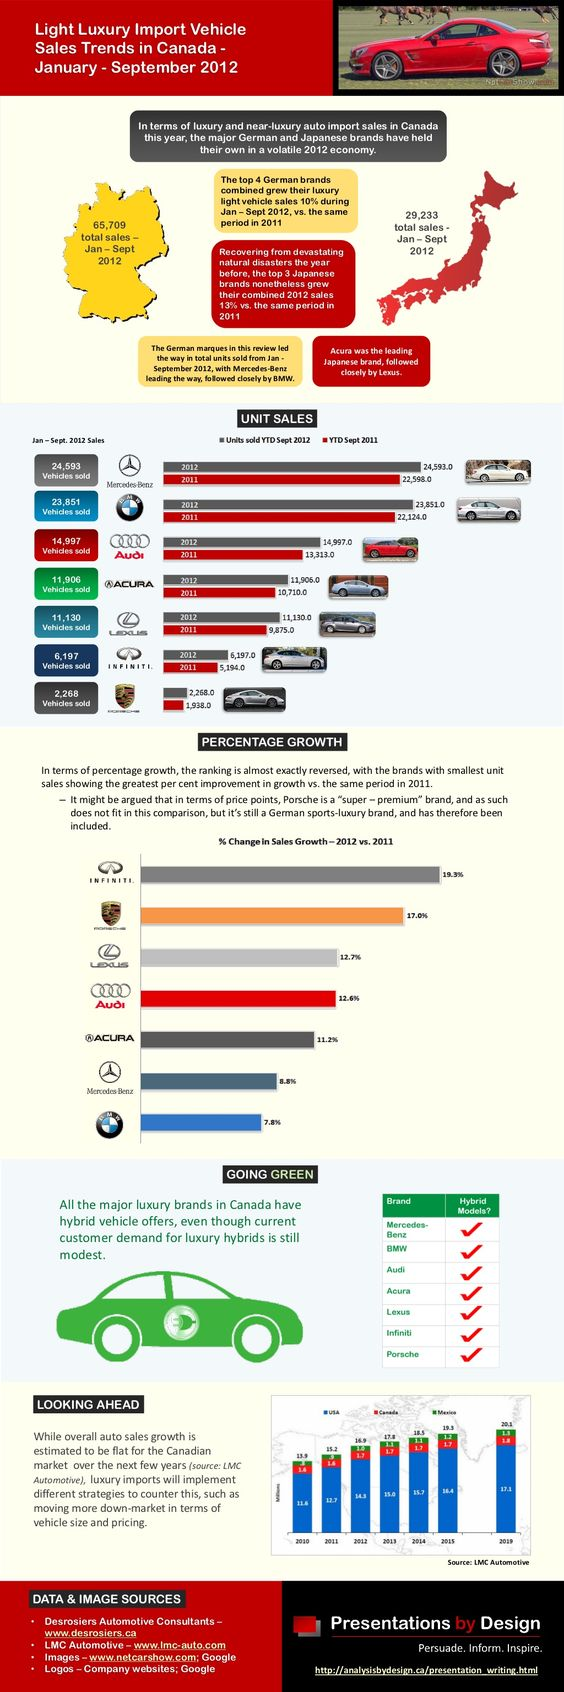 import-luxury-auto-sales-trends-in-canada-sept-2012-d-pershad by Deepak Pershad via Slideshare